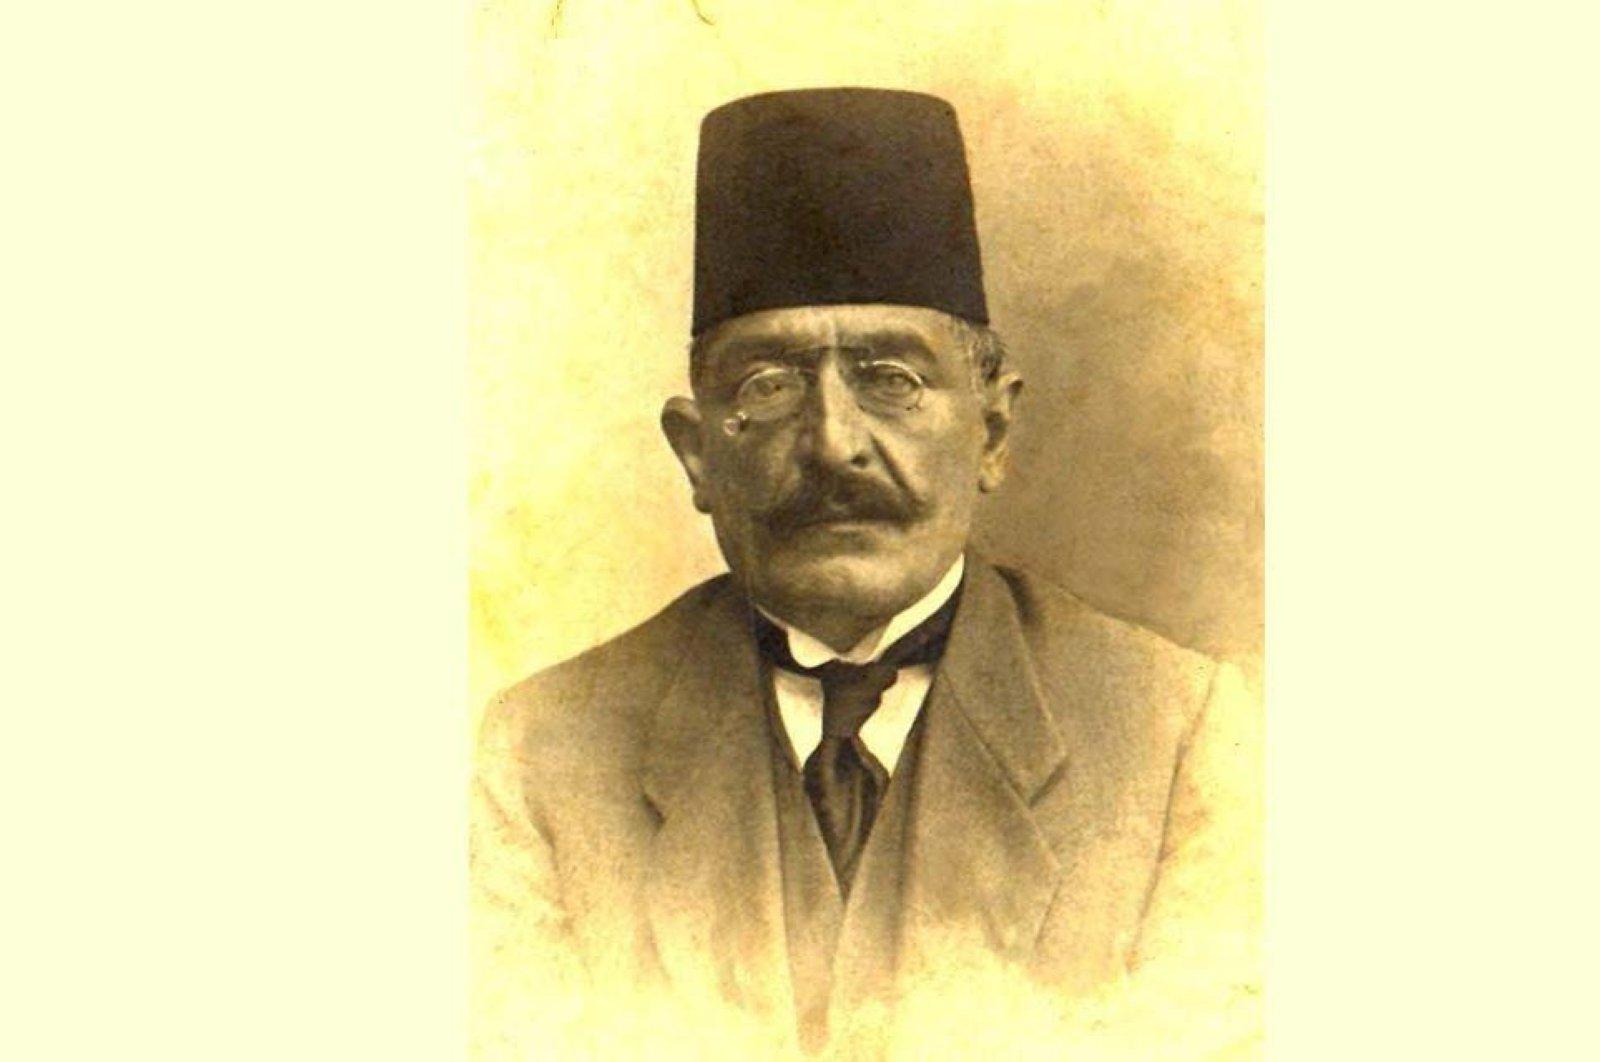 Ahmet Ağaoğlu defended liberalism, especially in economy.